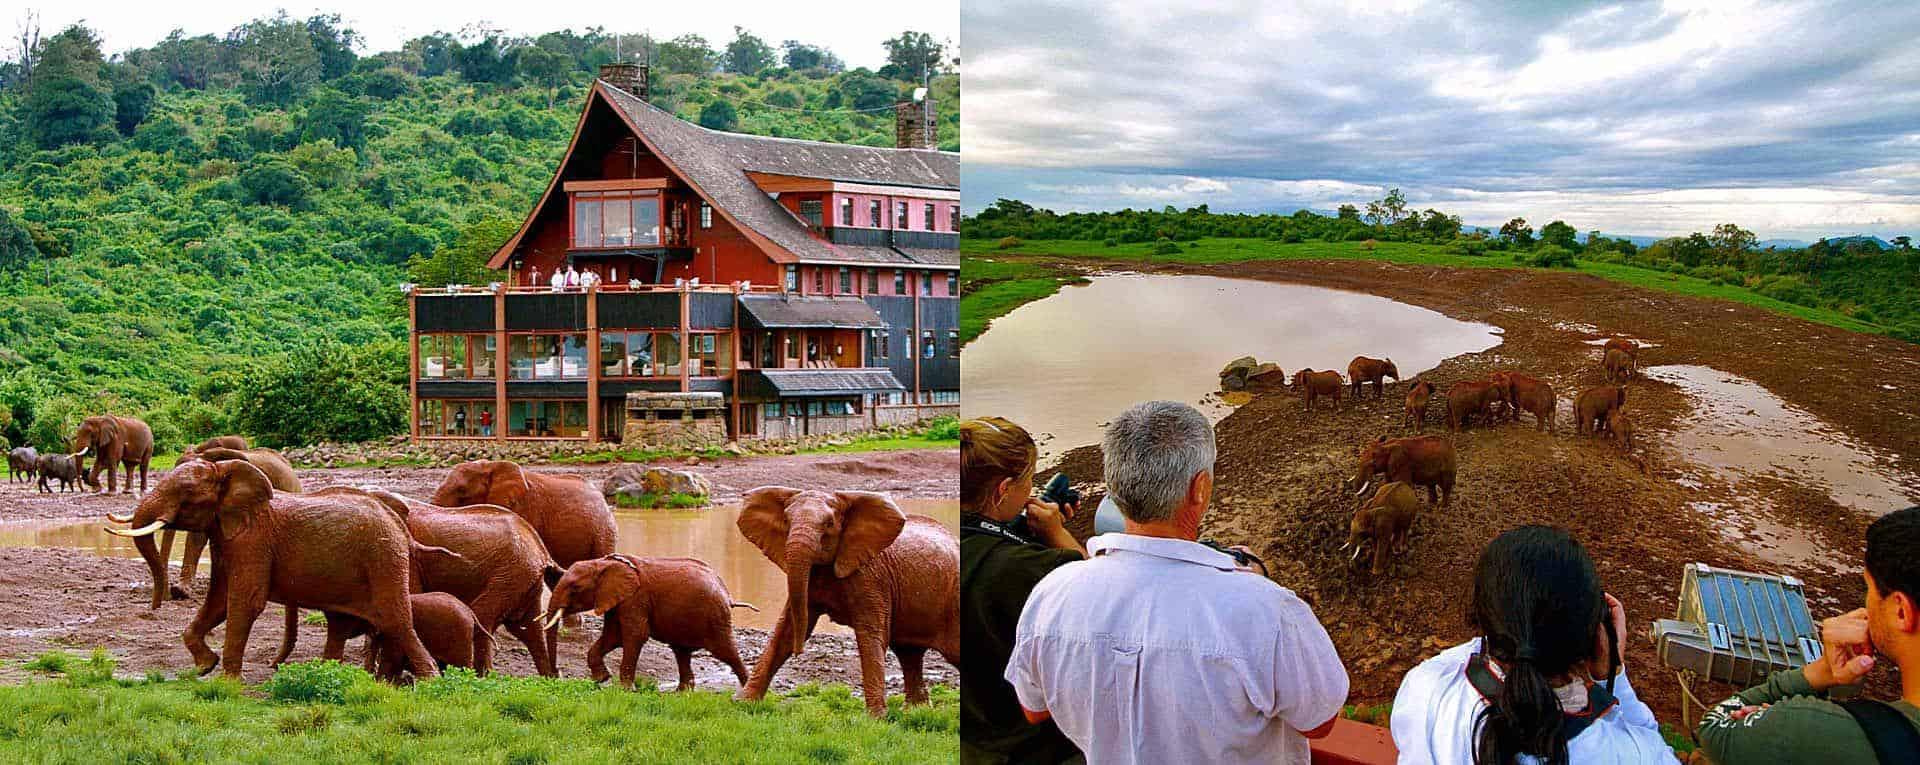 Expert Rating Reviews >> The Ark, Aberdare - Kenya - AfricanMecca Safaris & Tours